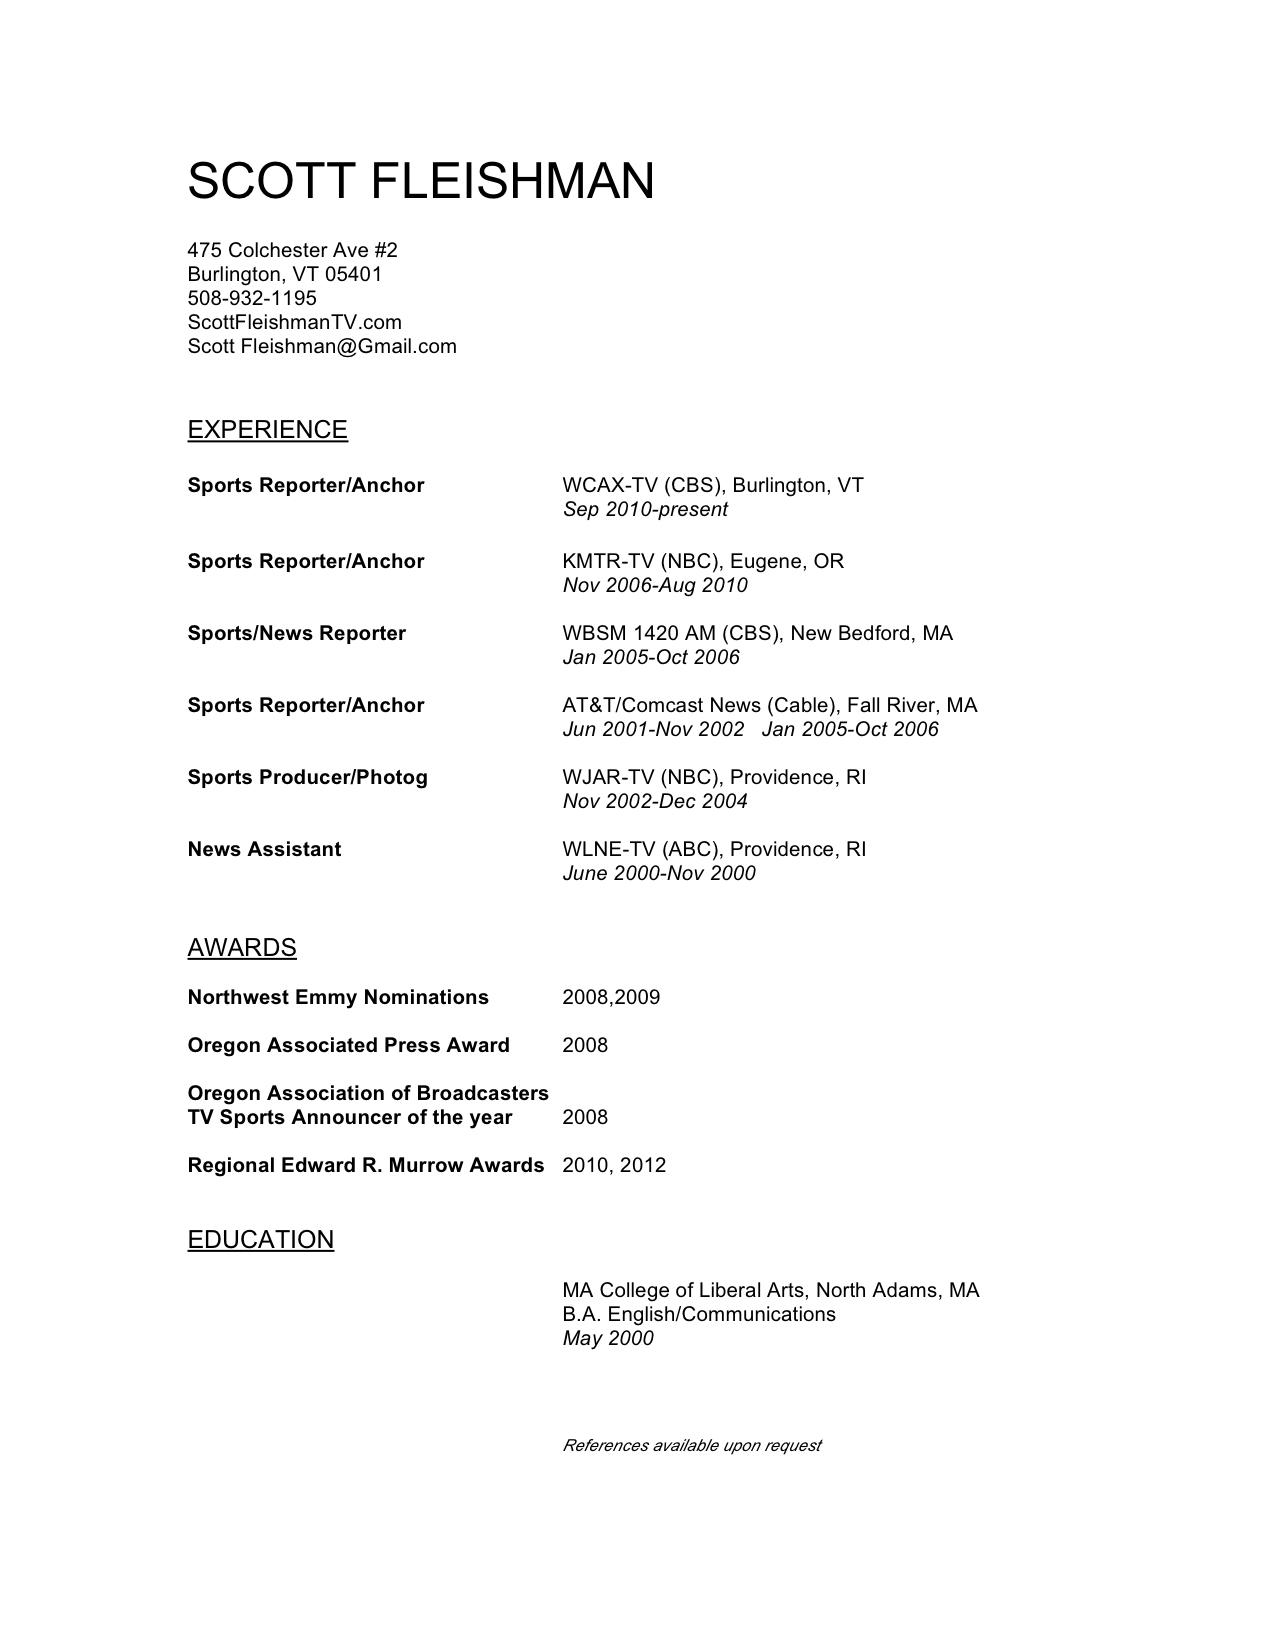 halliburton research paper